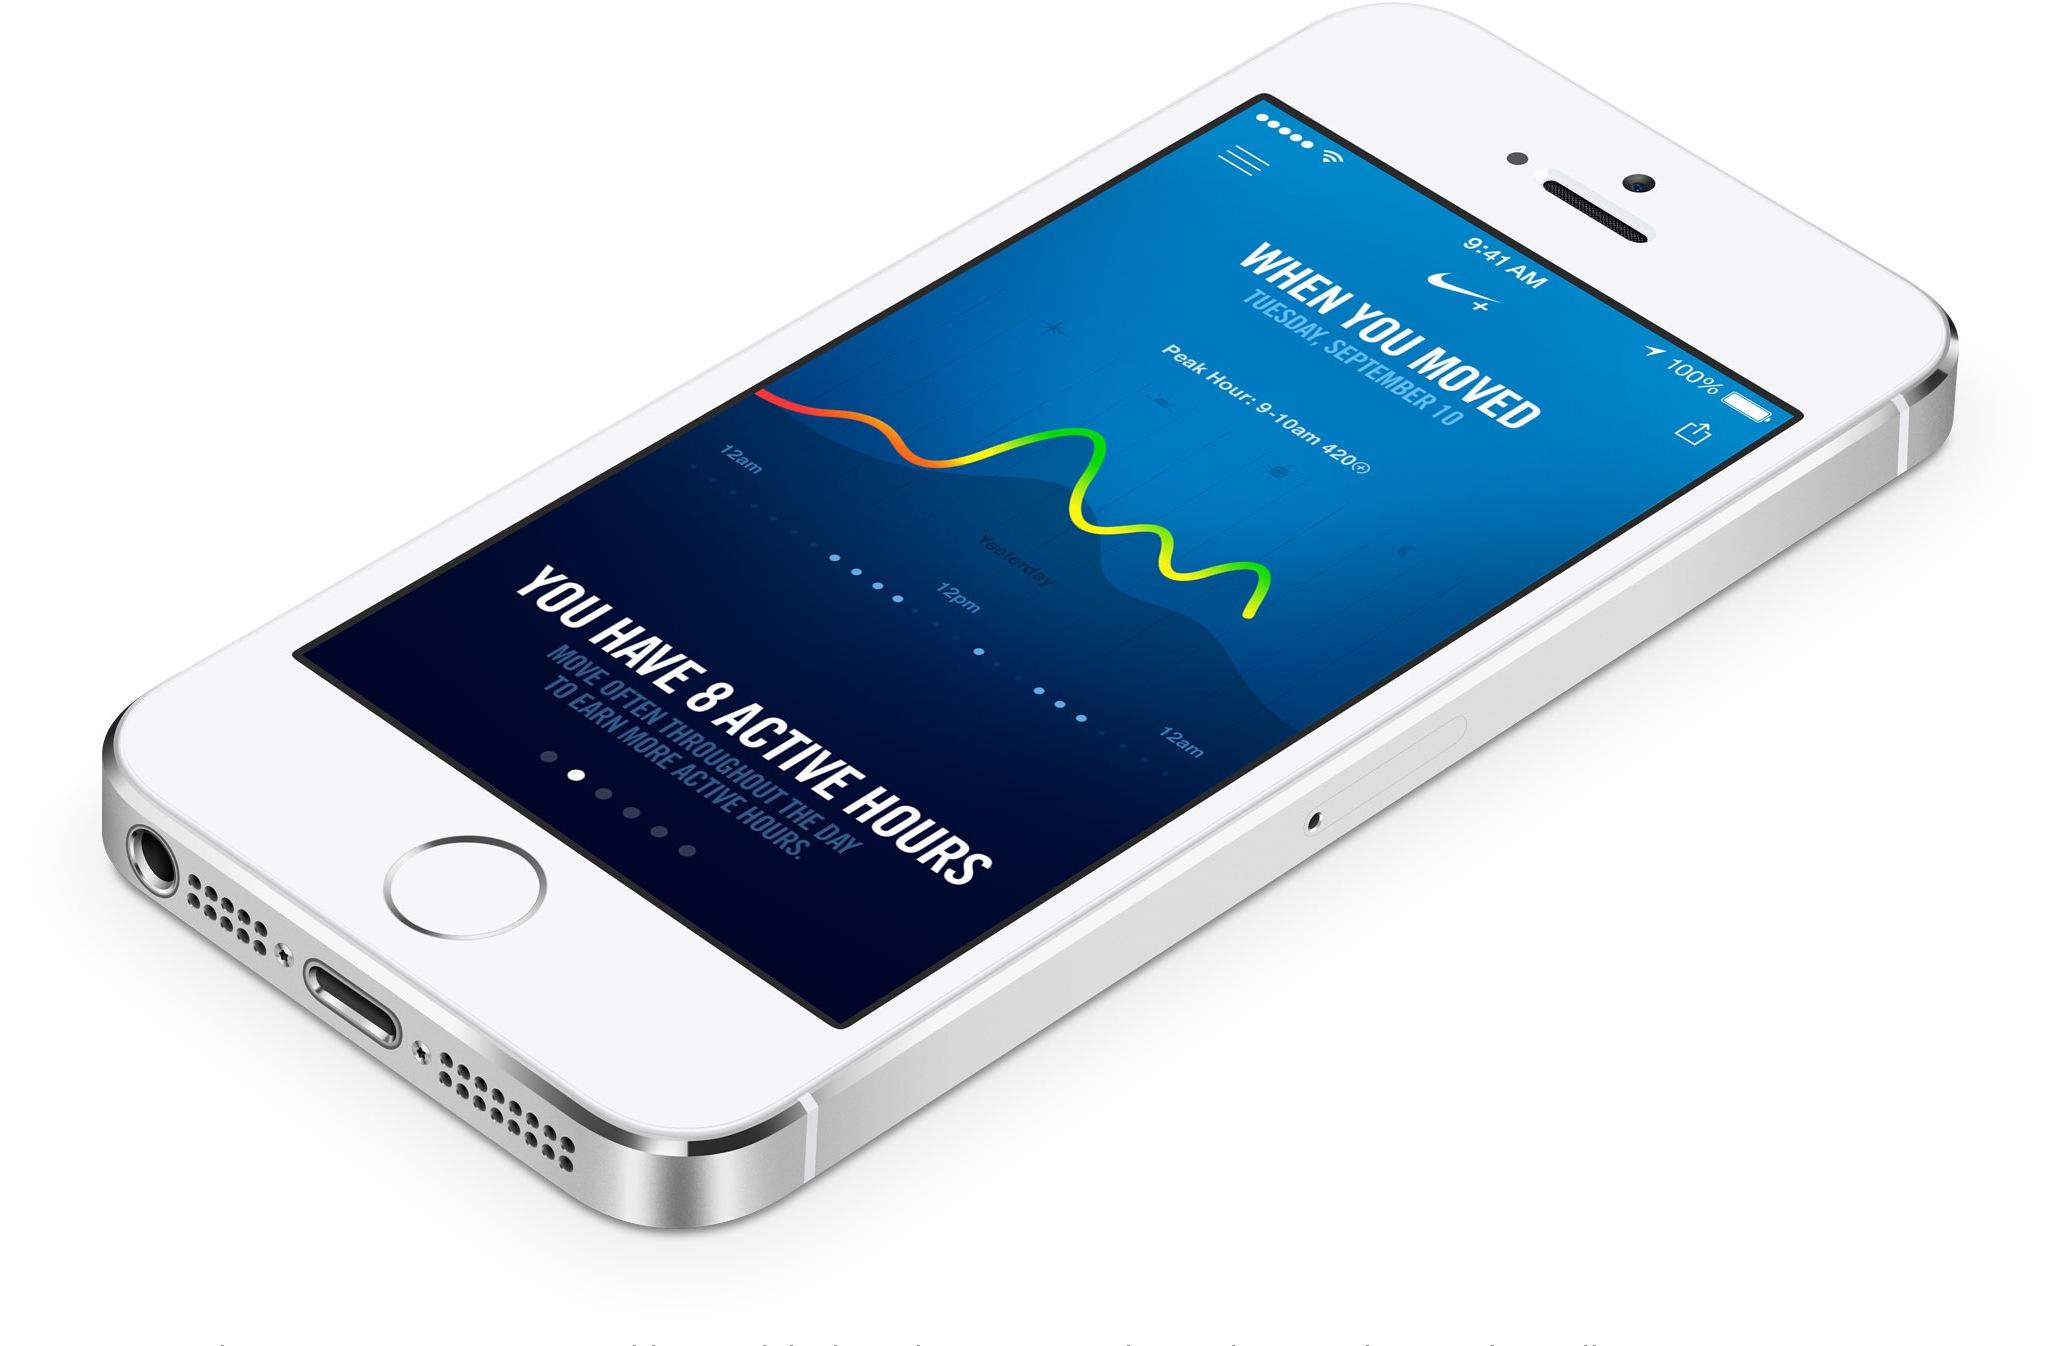 iPhone 5s rodando novo app da Nike